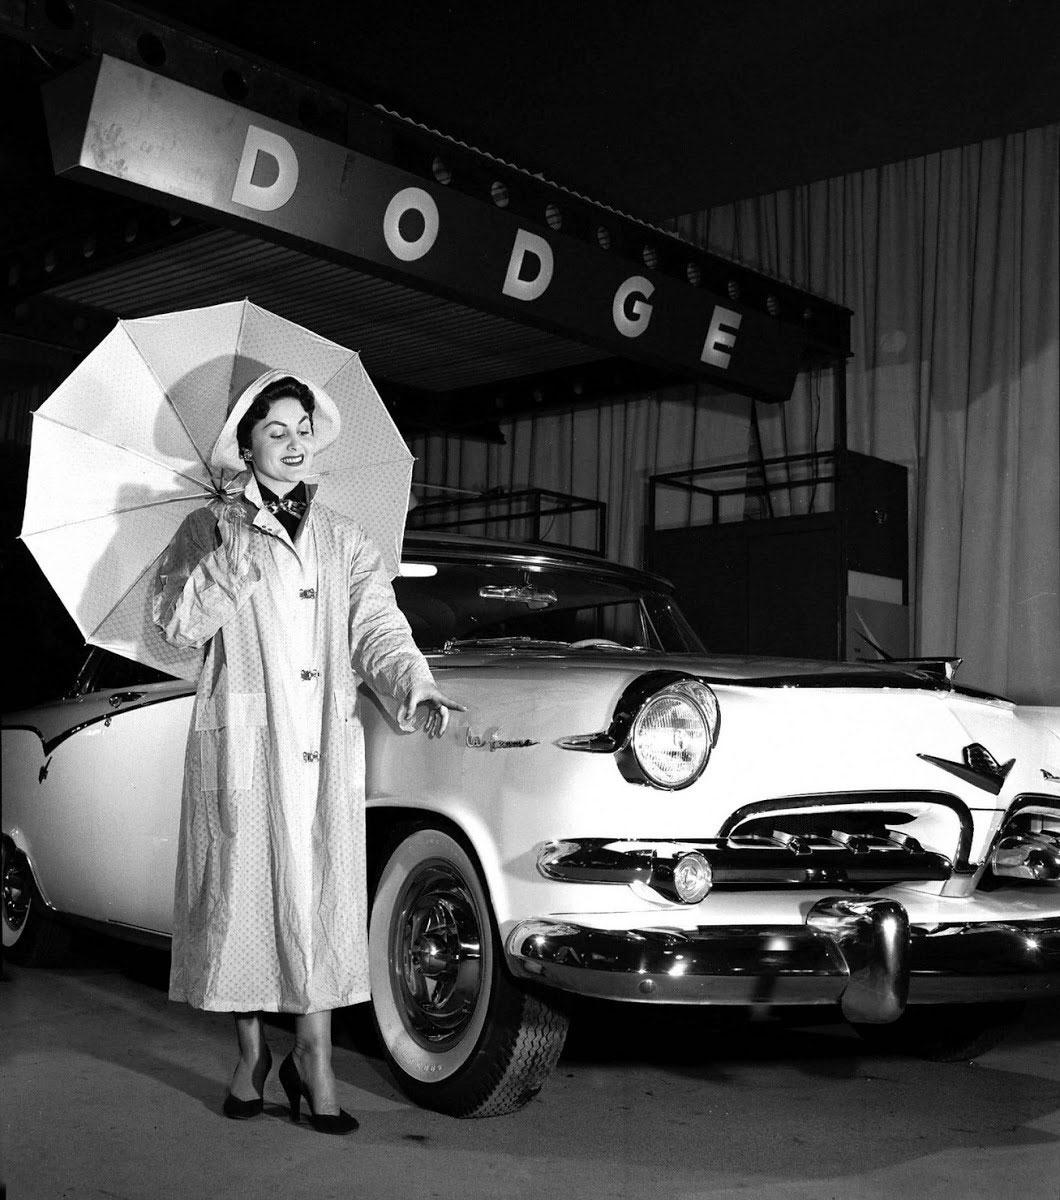 Dodge La Femme ad